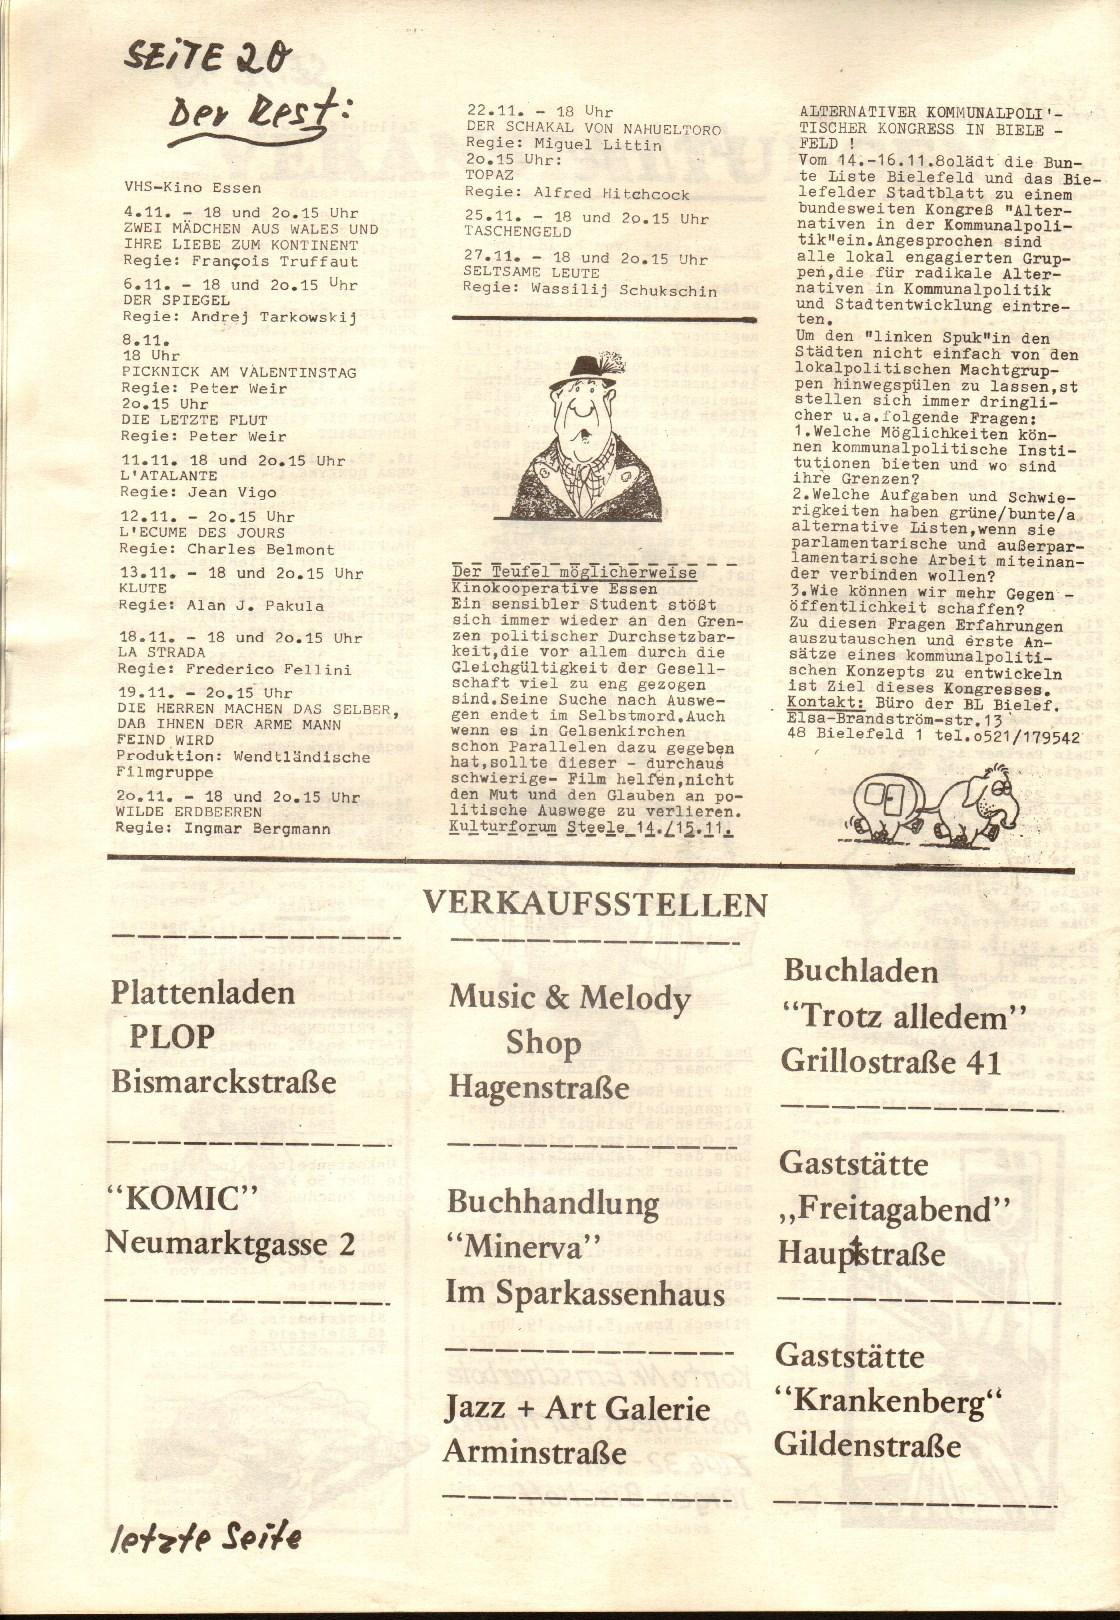 Gelsenkirchen_Emscherbote_1980_02_20